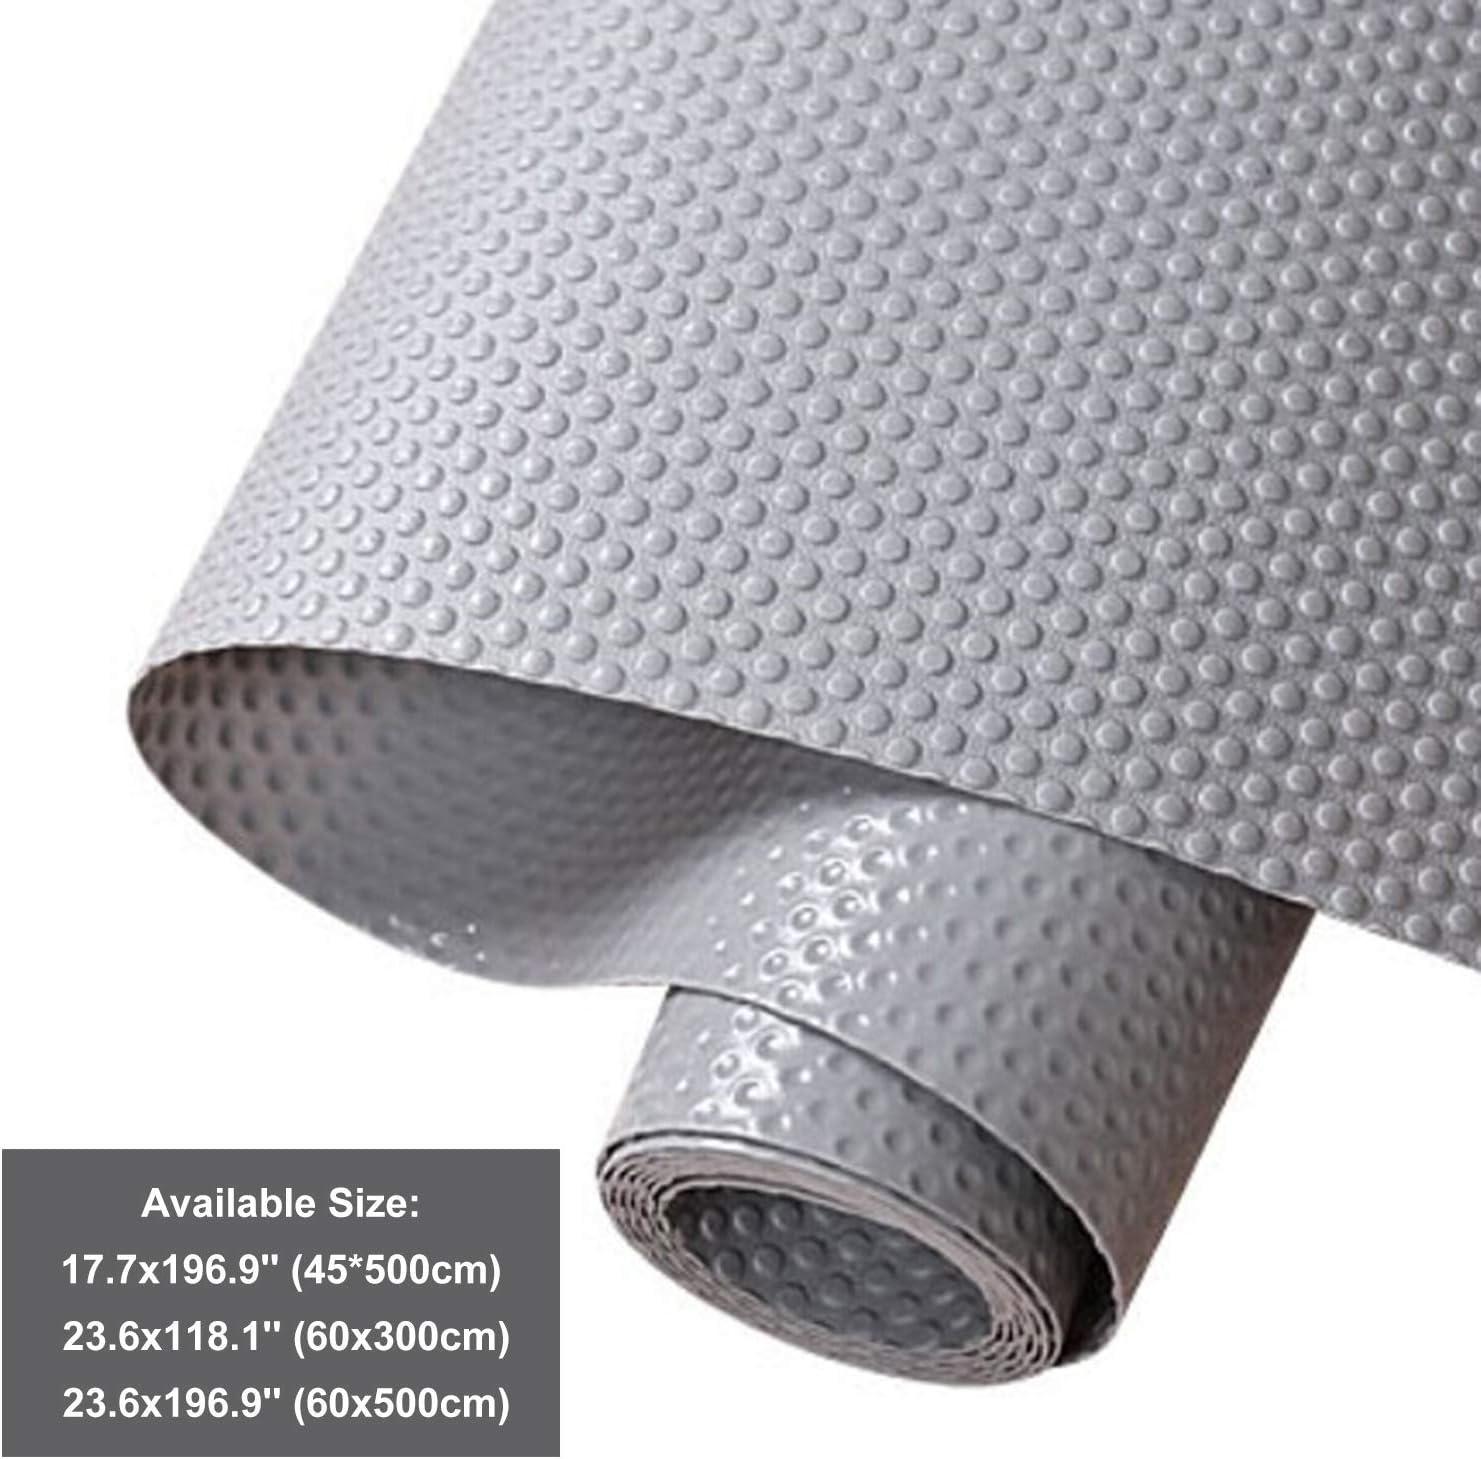 Hersvin Shelf Liners, 11.8x118.1 Inch EVA Non-Slip Drawer Mats, Non-Adhesive Cupboard Pad, Kitchen Cabinet Lining Fridge Cushion for Home Office (Gray/Dot, 30x300cm)